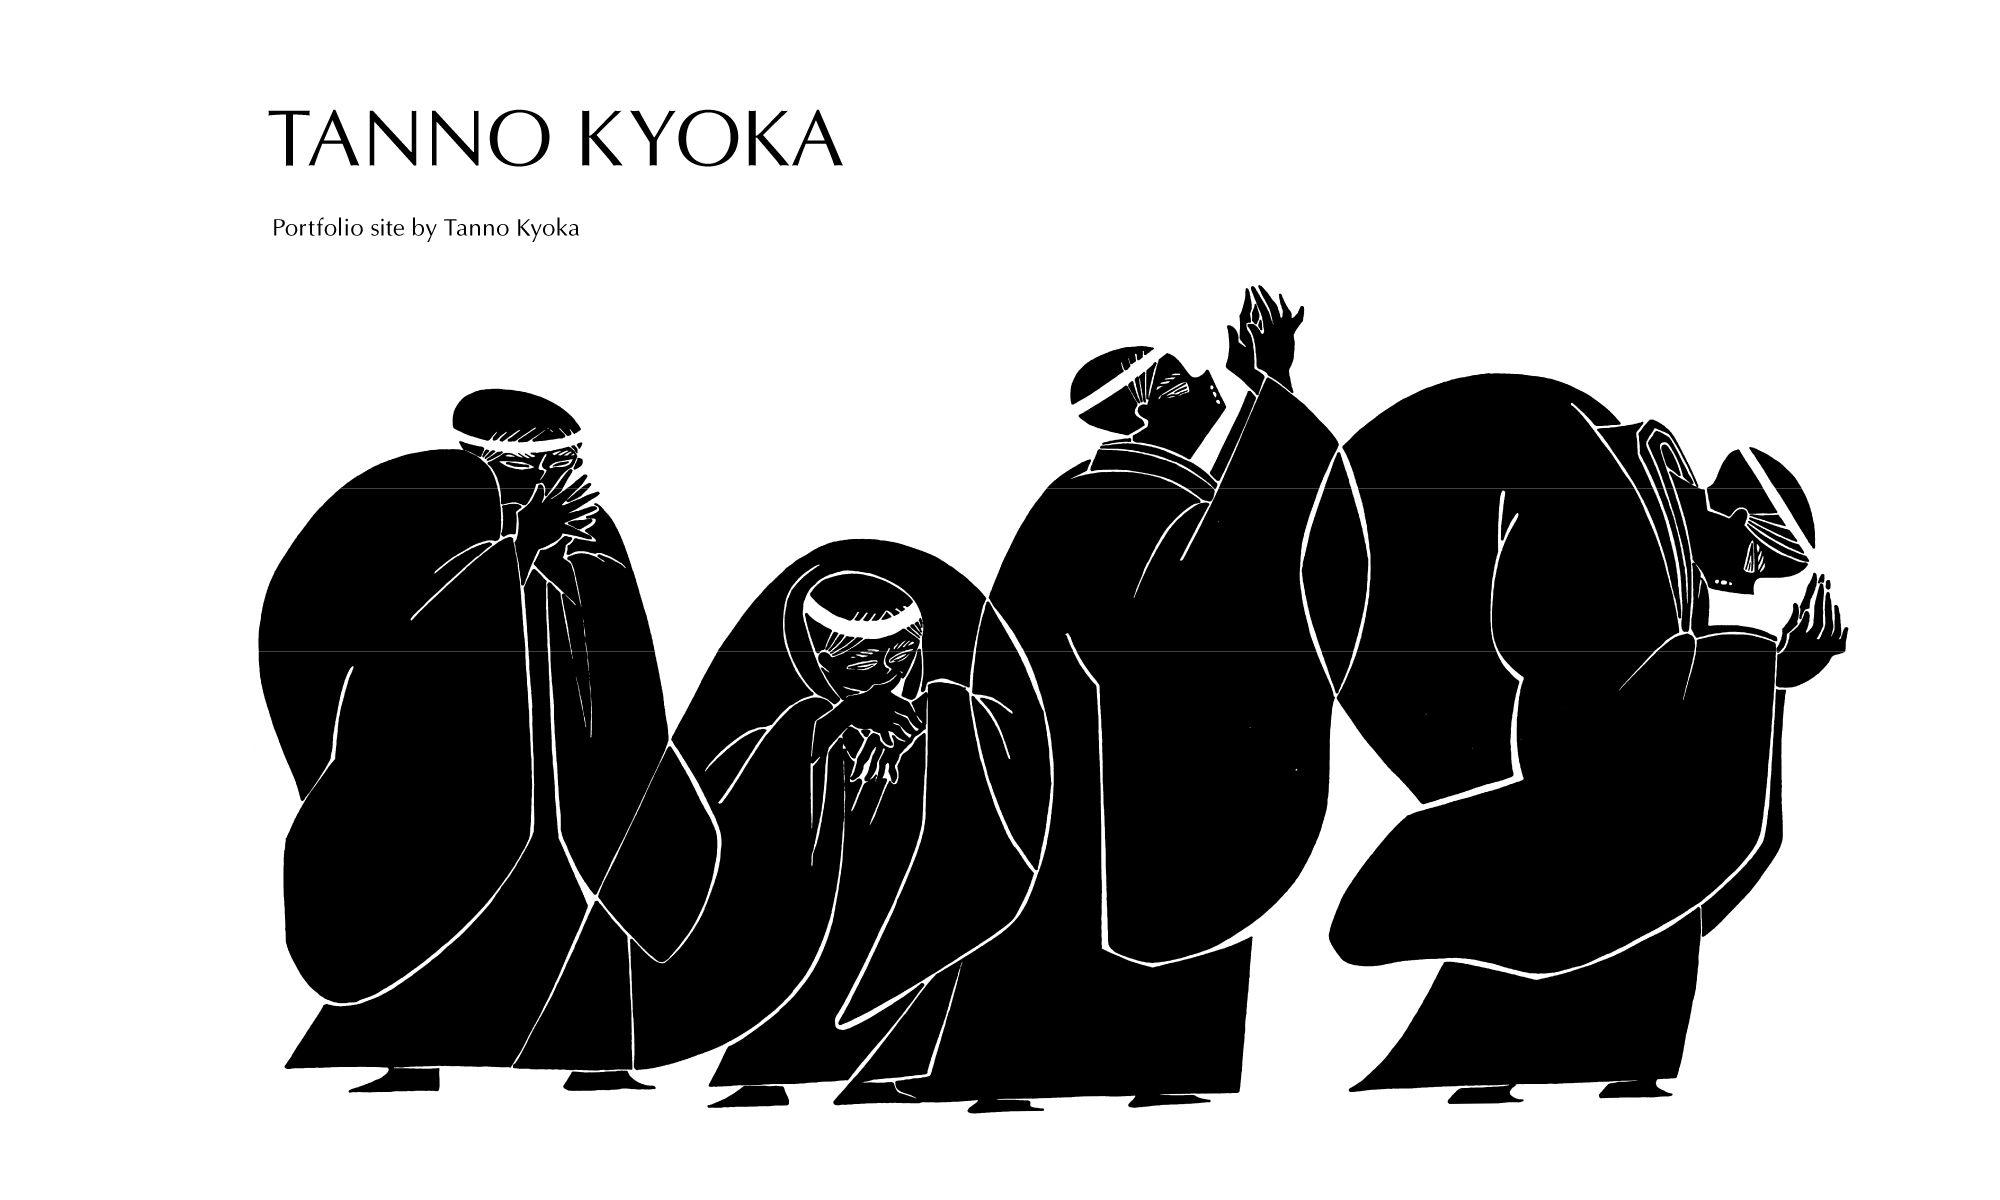 Tanno Kyoka Nipponia山田和寛 新書体ヱナのwebイラスト 燕 2020 イラスト 新書 体